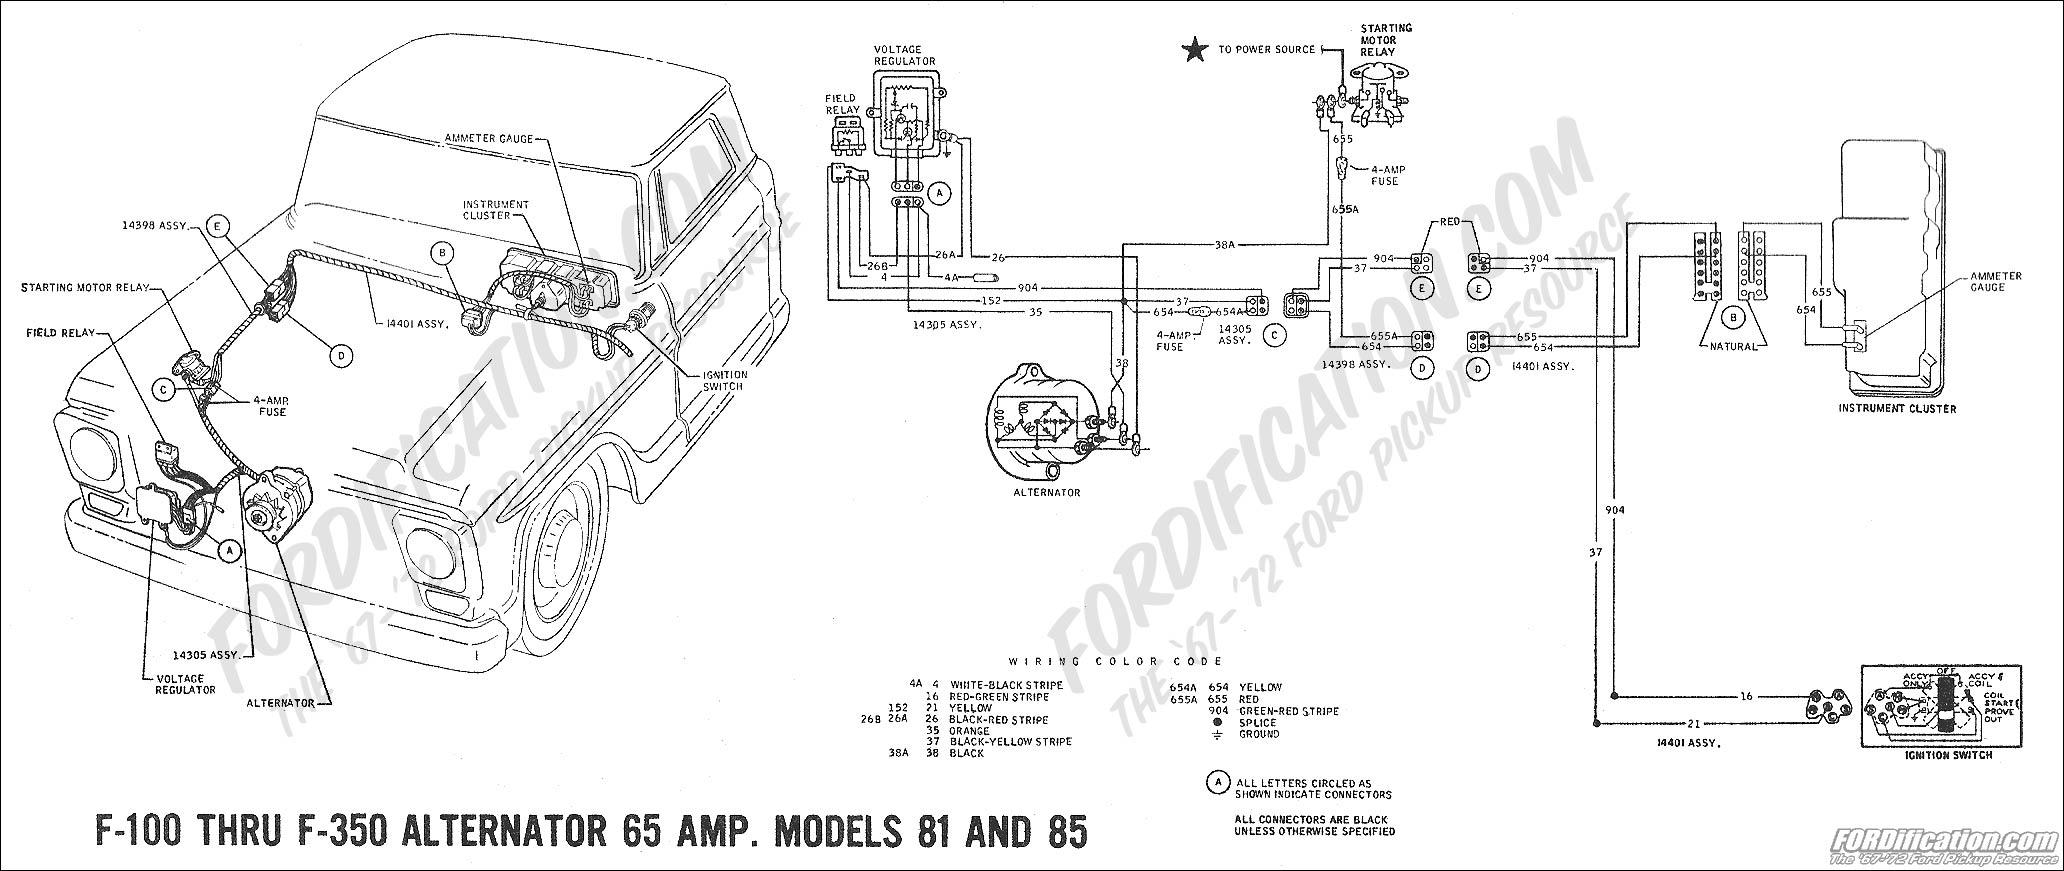 Ford 555c Alternator Wiring Diagram - 3.mwp.zionsnowboards.de • Ford D Alternator Wiring Diagram on ford 345d wiring diagram, ford 555b wiring diagram, ford 555 wiring diagram, ford 555e wiring diagram, ford 555a wiring diagram, ford 545c wiring diagram, ford 555c wiring diagram,